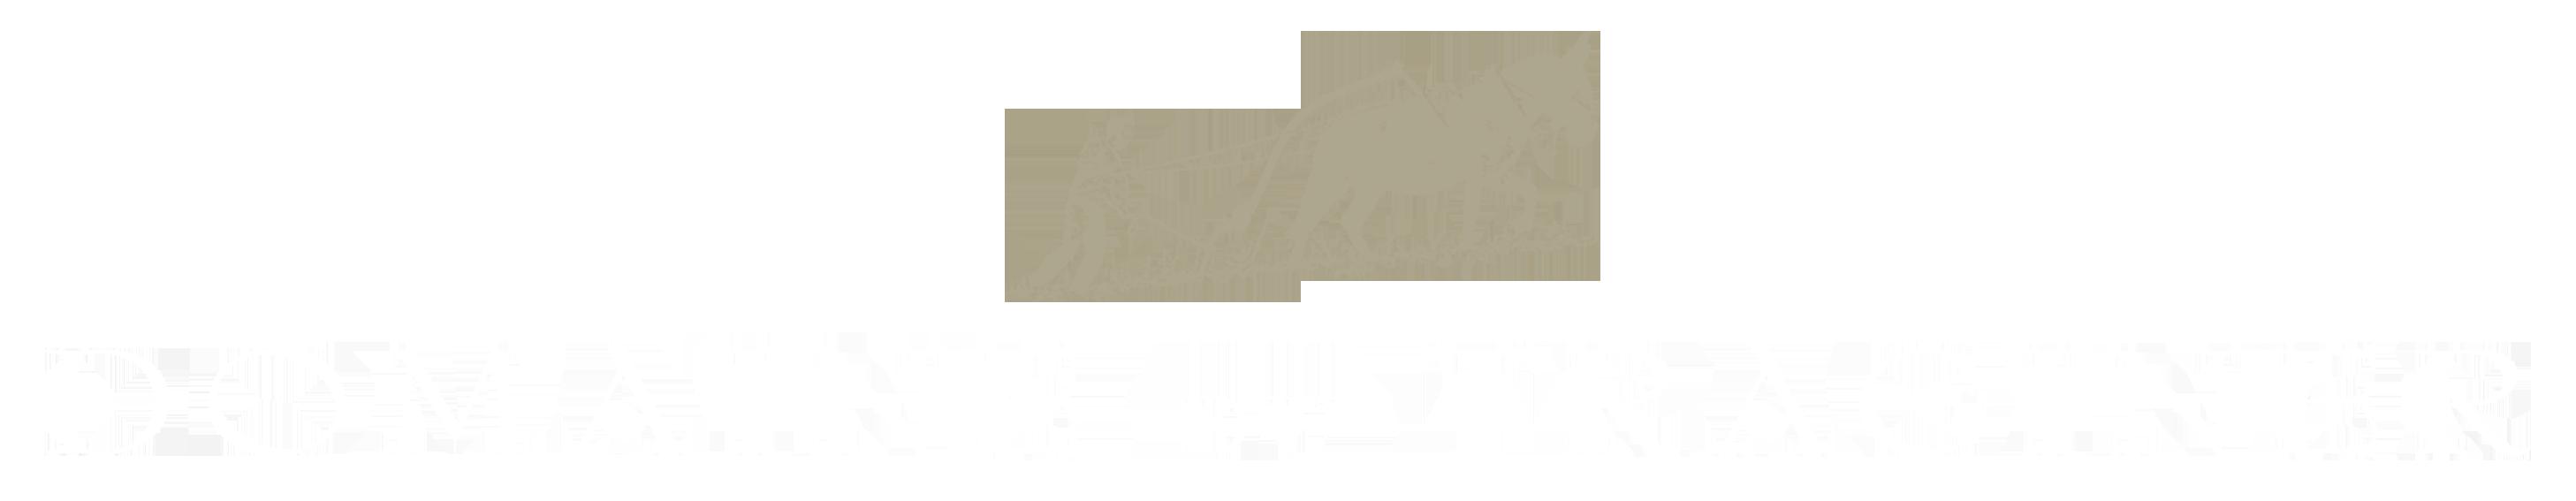 Domaine du Traginer Logo